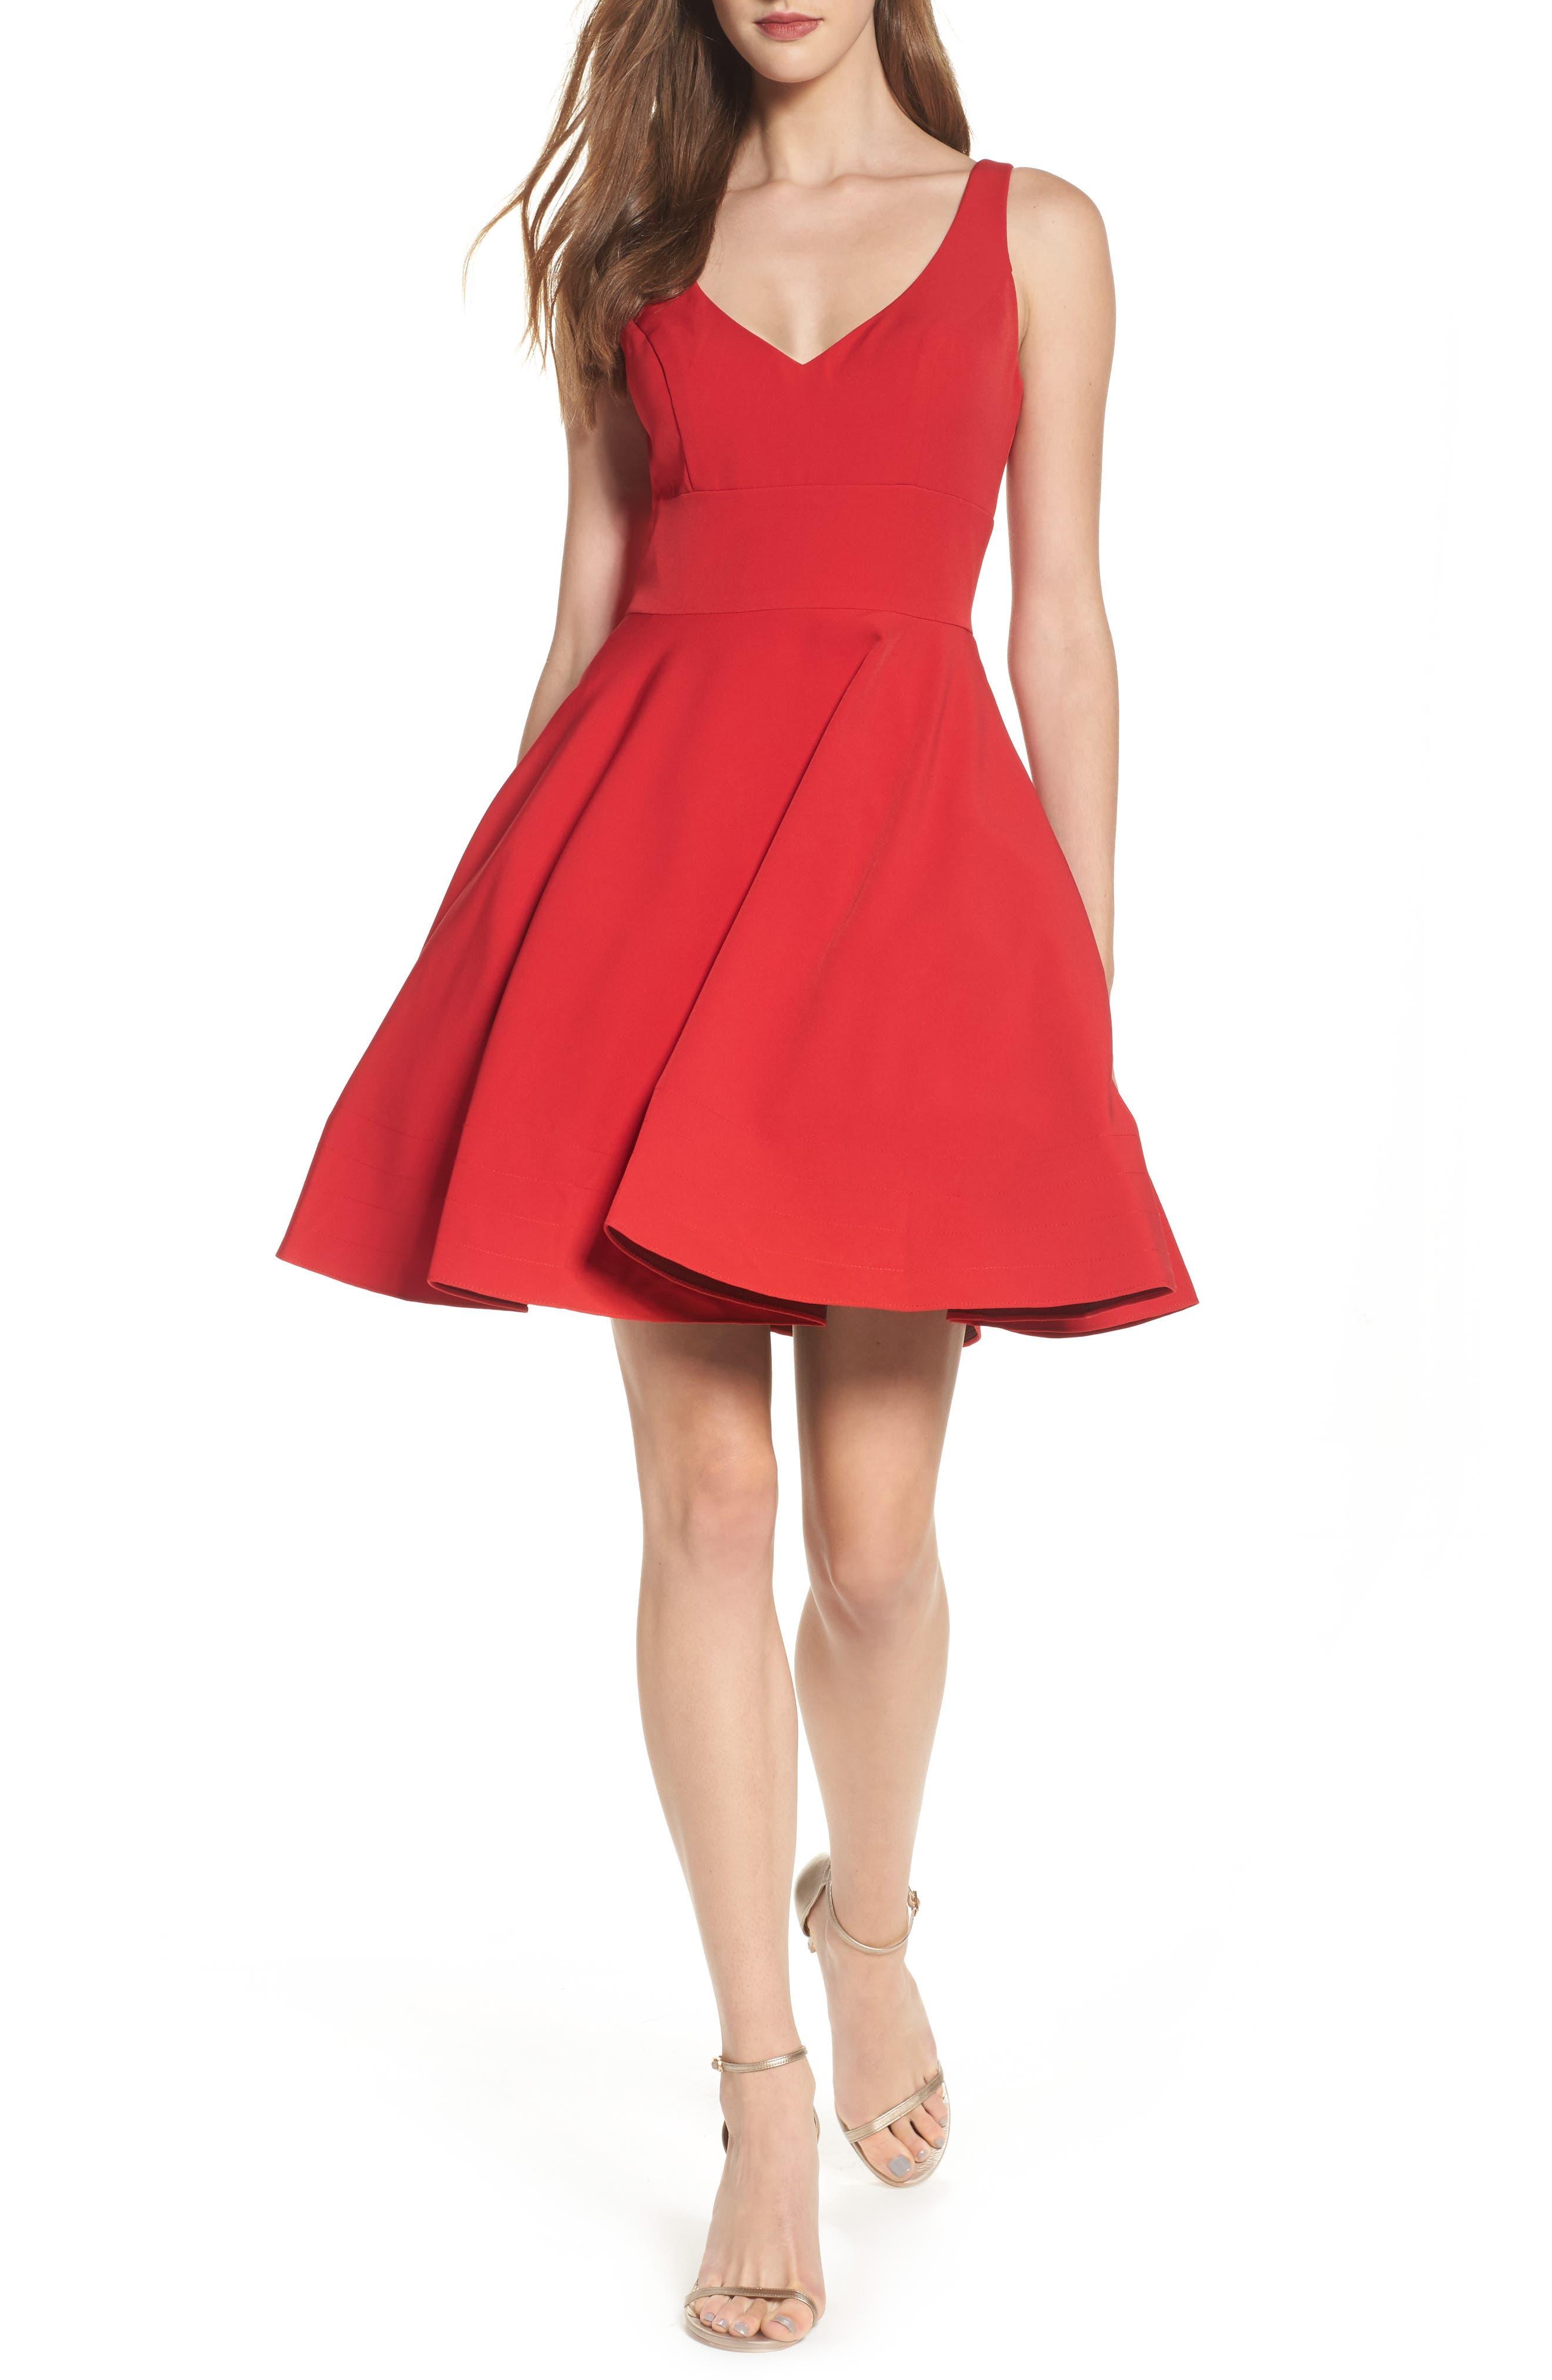 Alternate Image 1 Selected - Xscape V-Neck Fit & Flare Dress